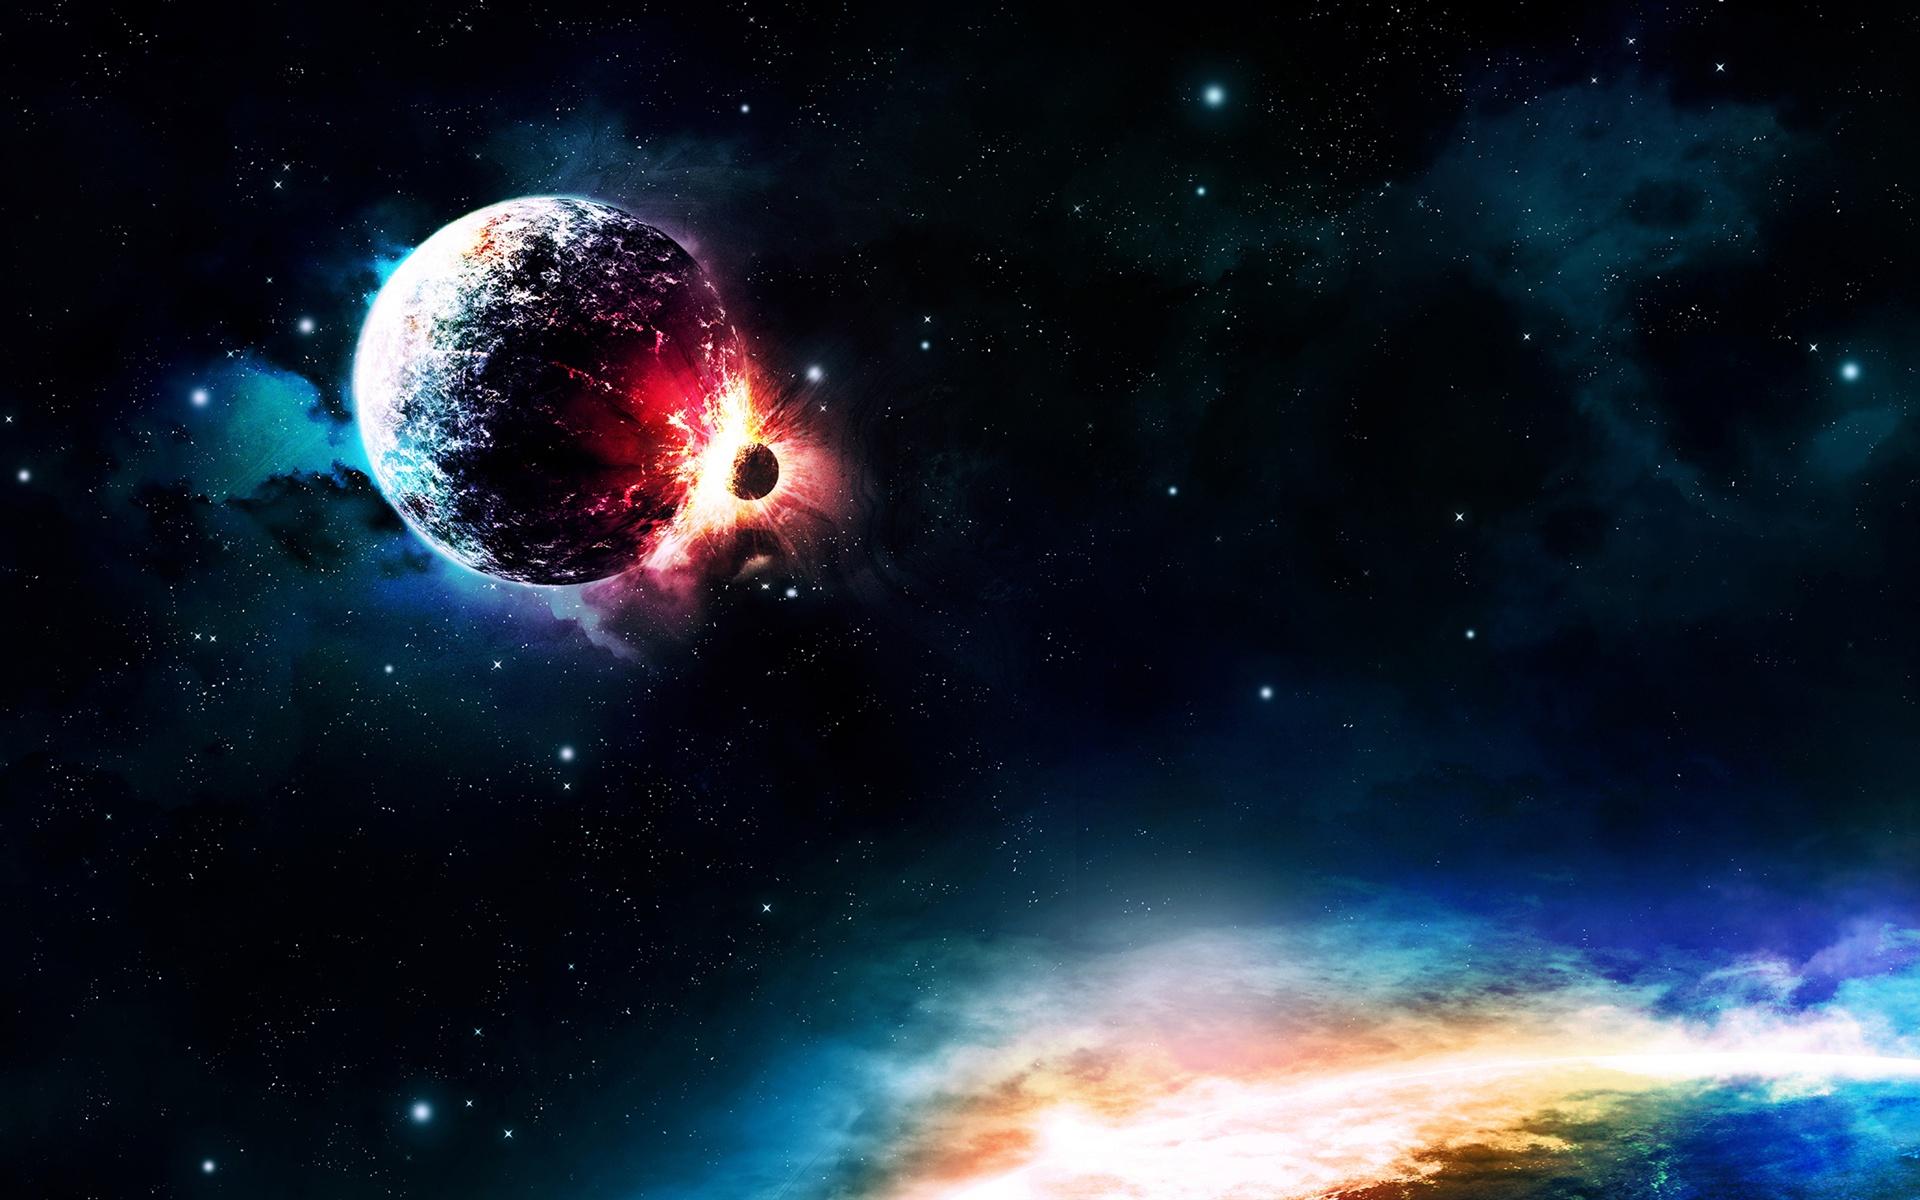 Planets-collision-colors-light_1920x1200.jpg